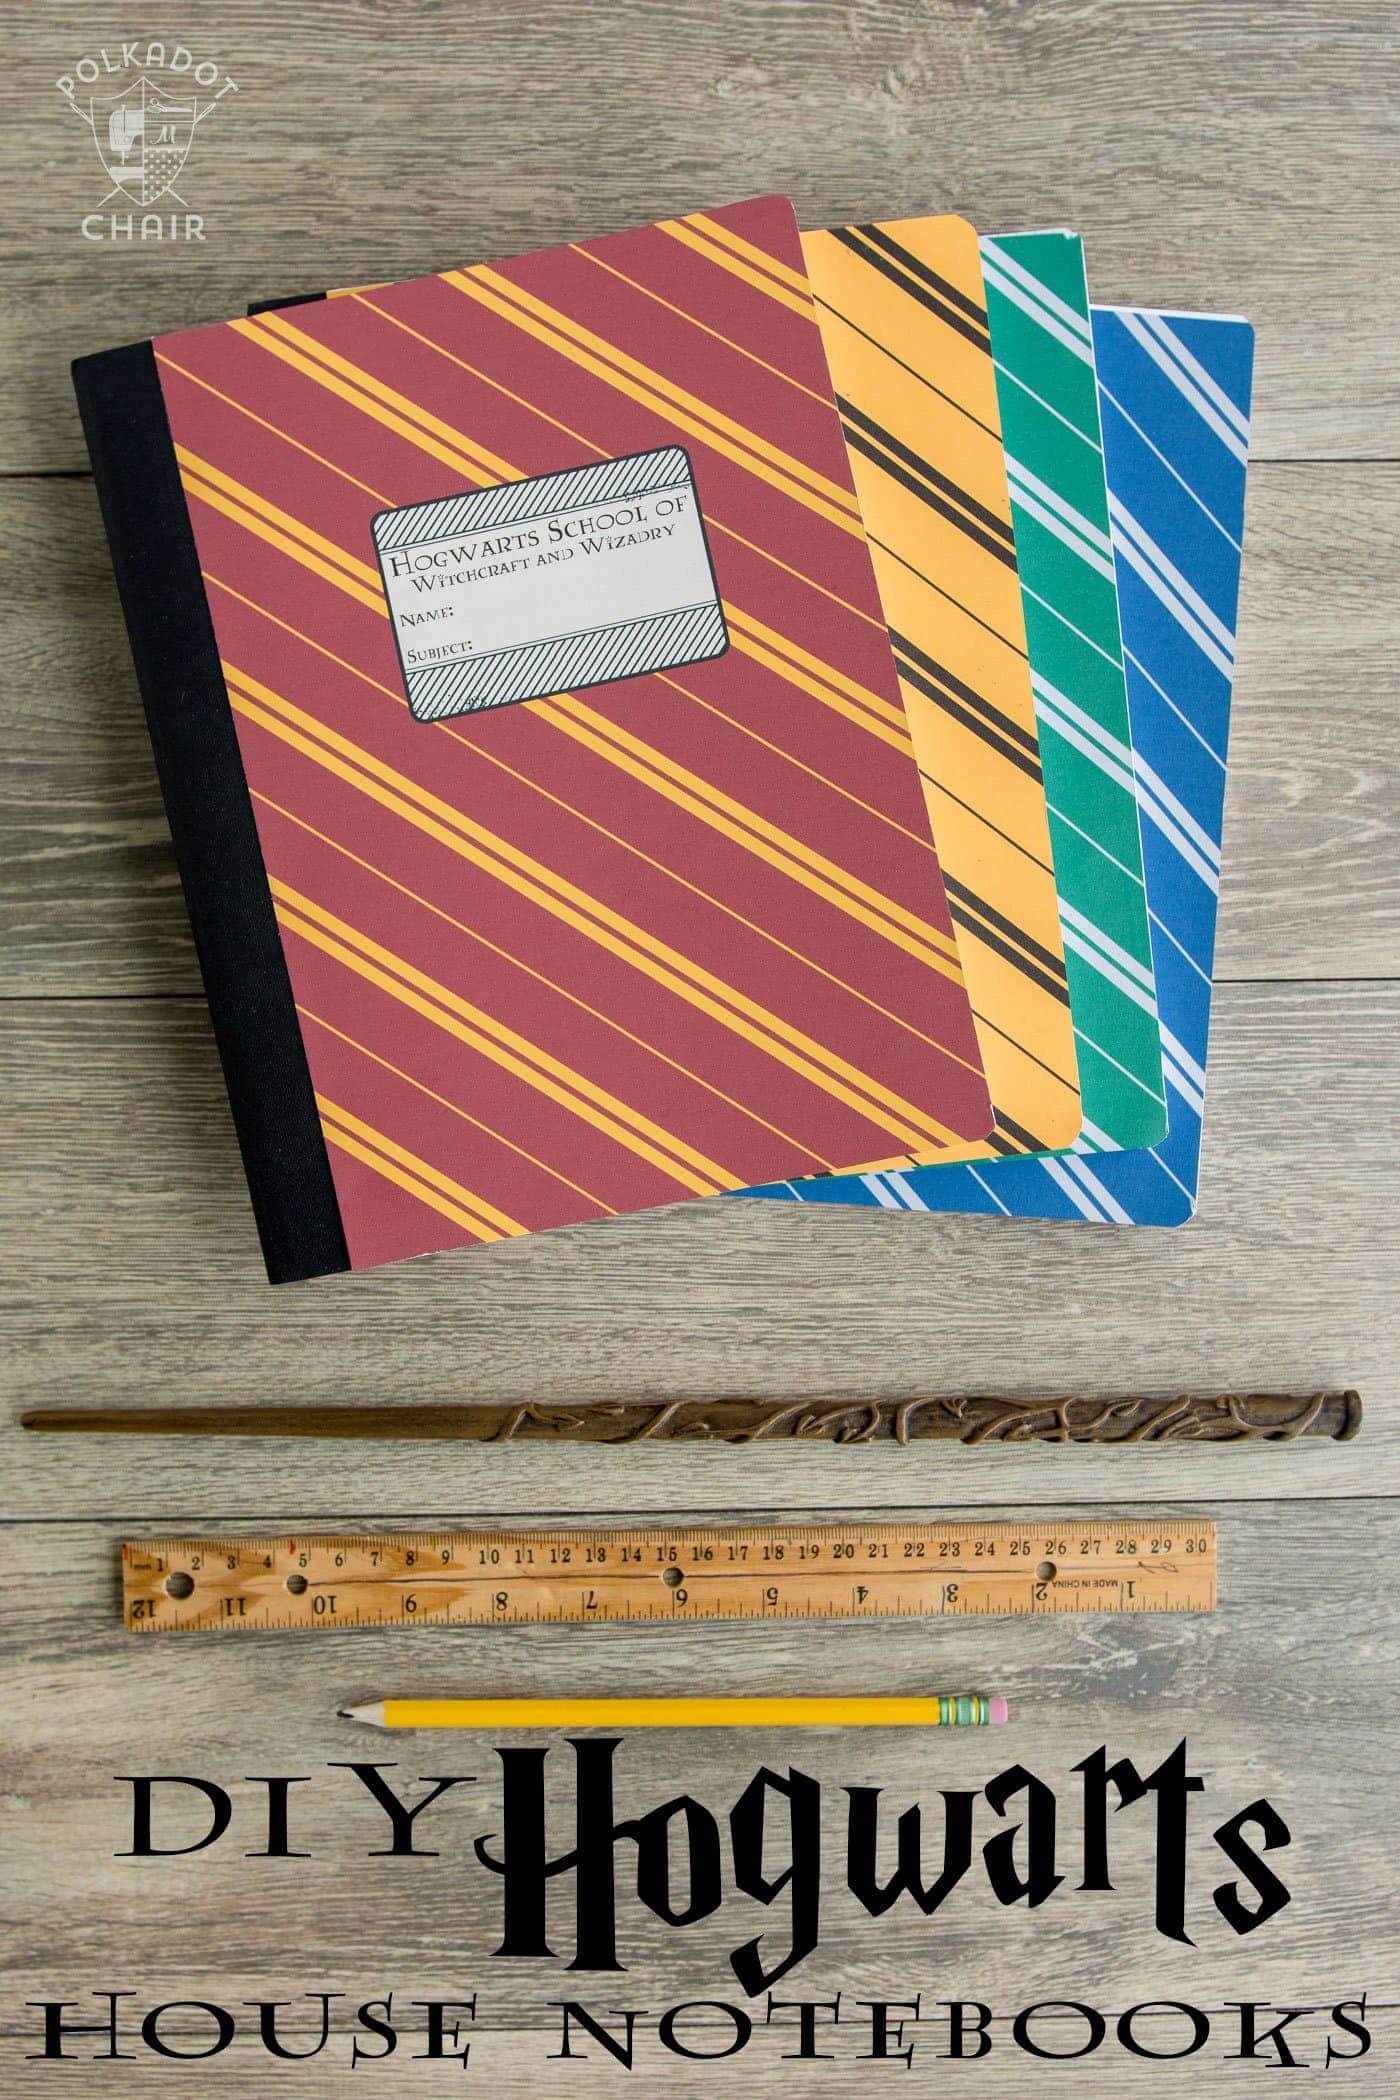 Book Cover Craft Room : Diy hogwarts inspired house notebooks harry potter craft